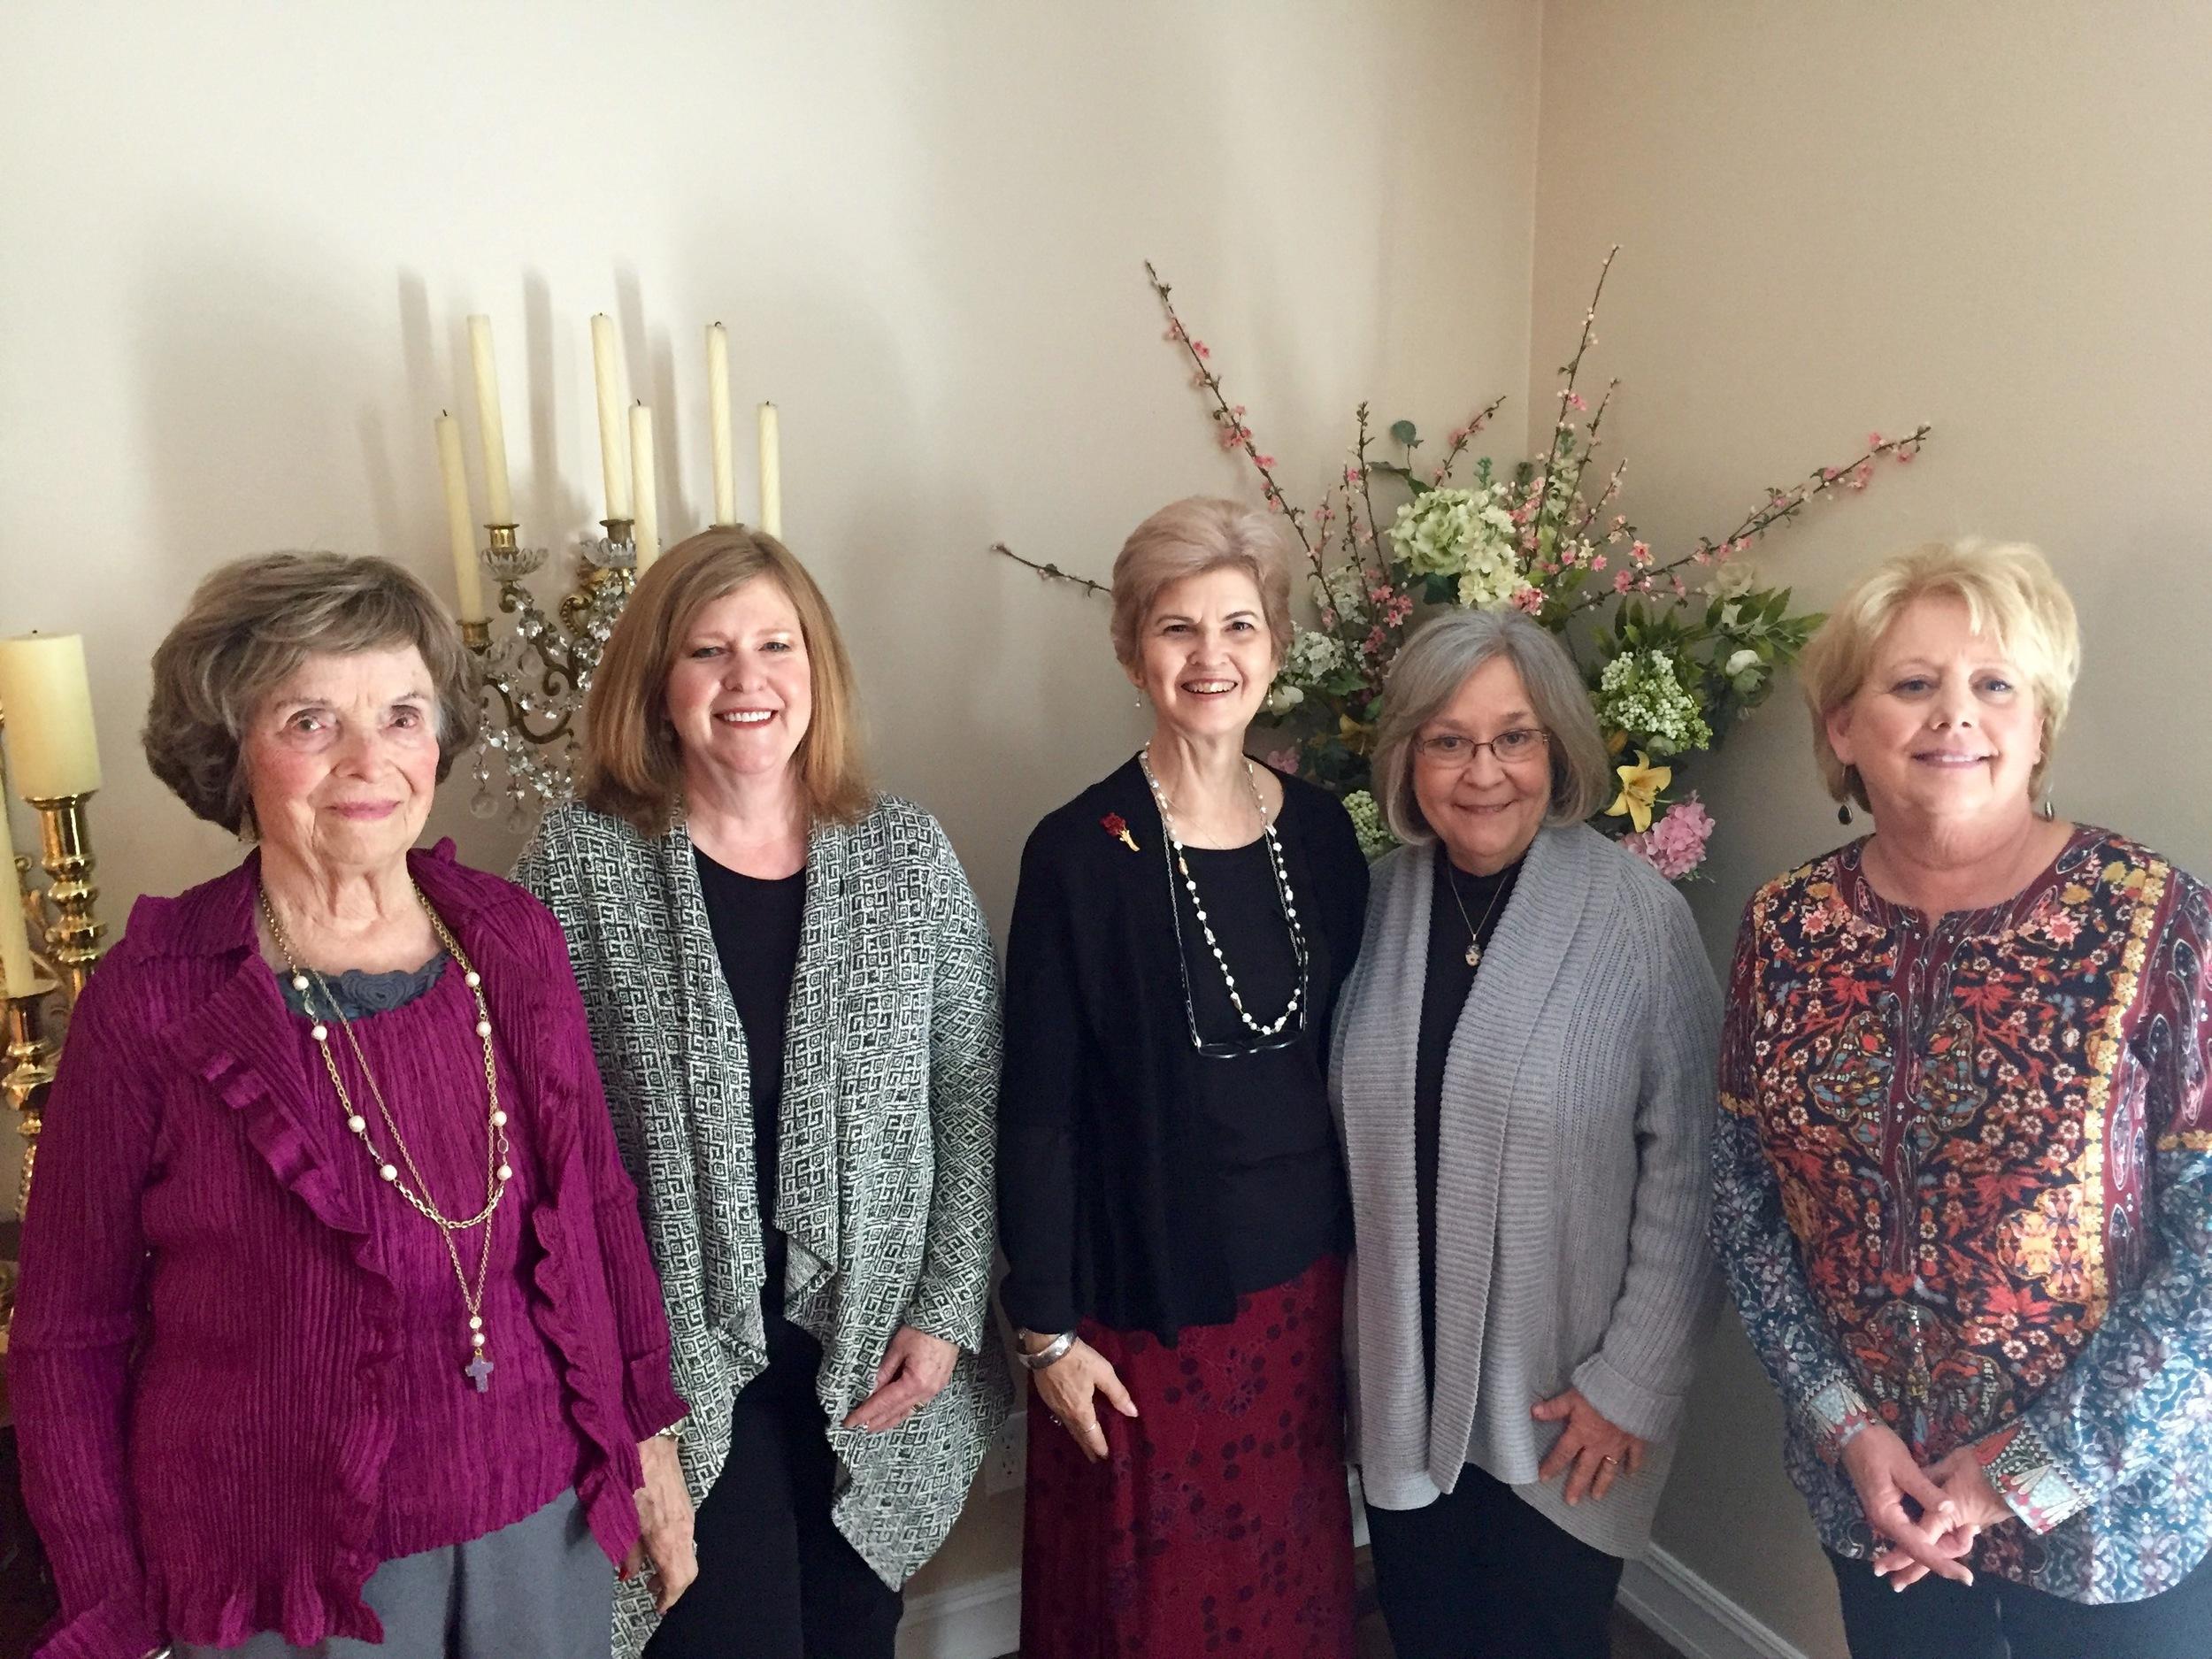 February hostesses - Dorothy Utesch, Donna Cummins, Donna Bennett, Scottie Davis and Linda Blum. Thank you ladies for a beautiful lunch!